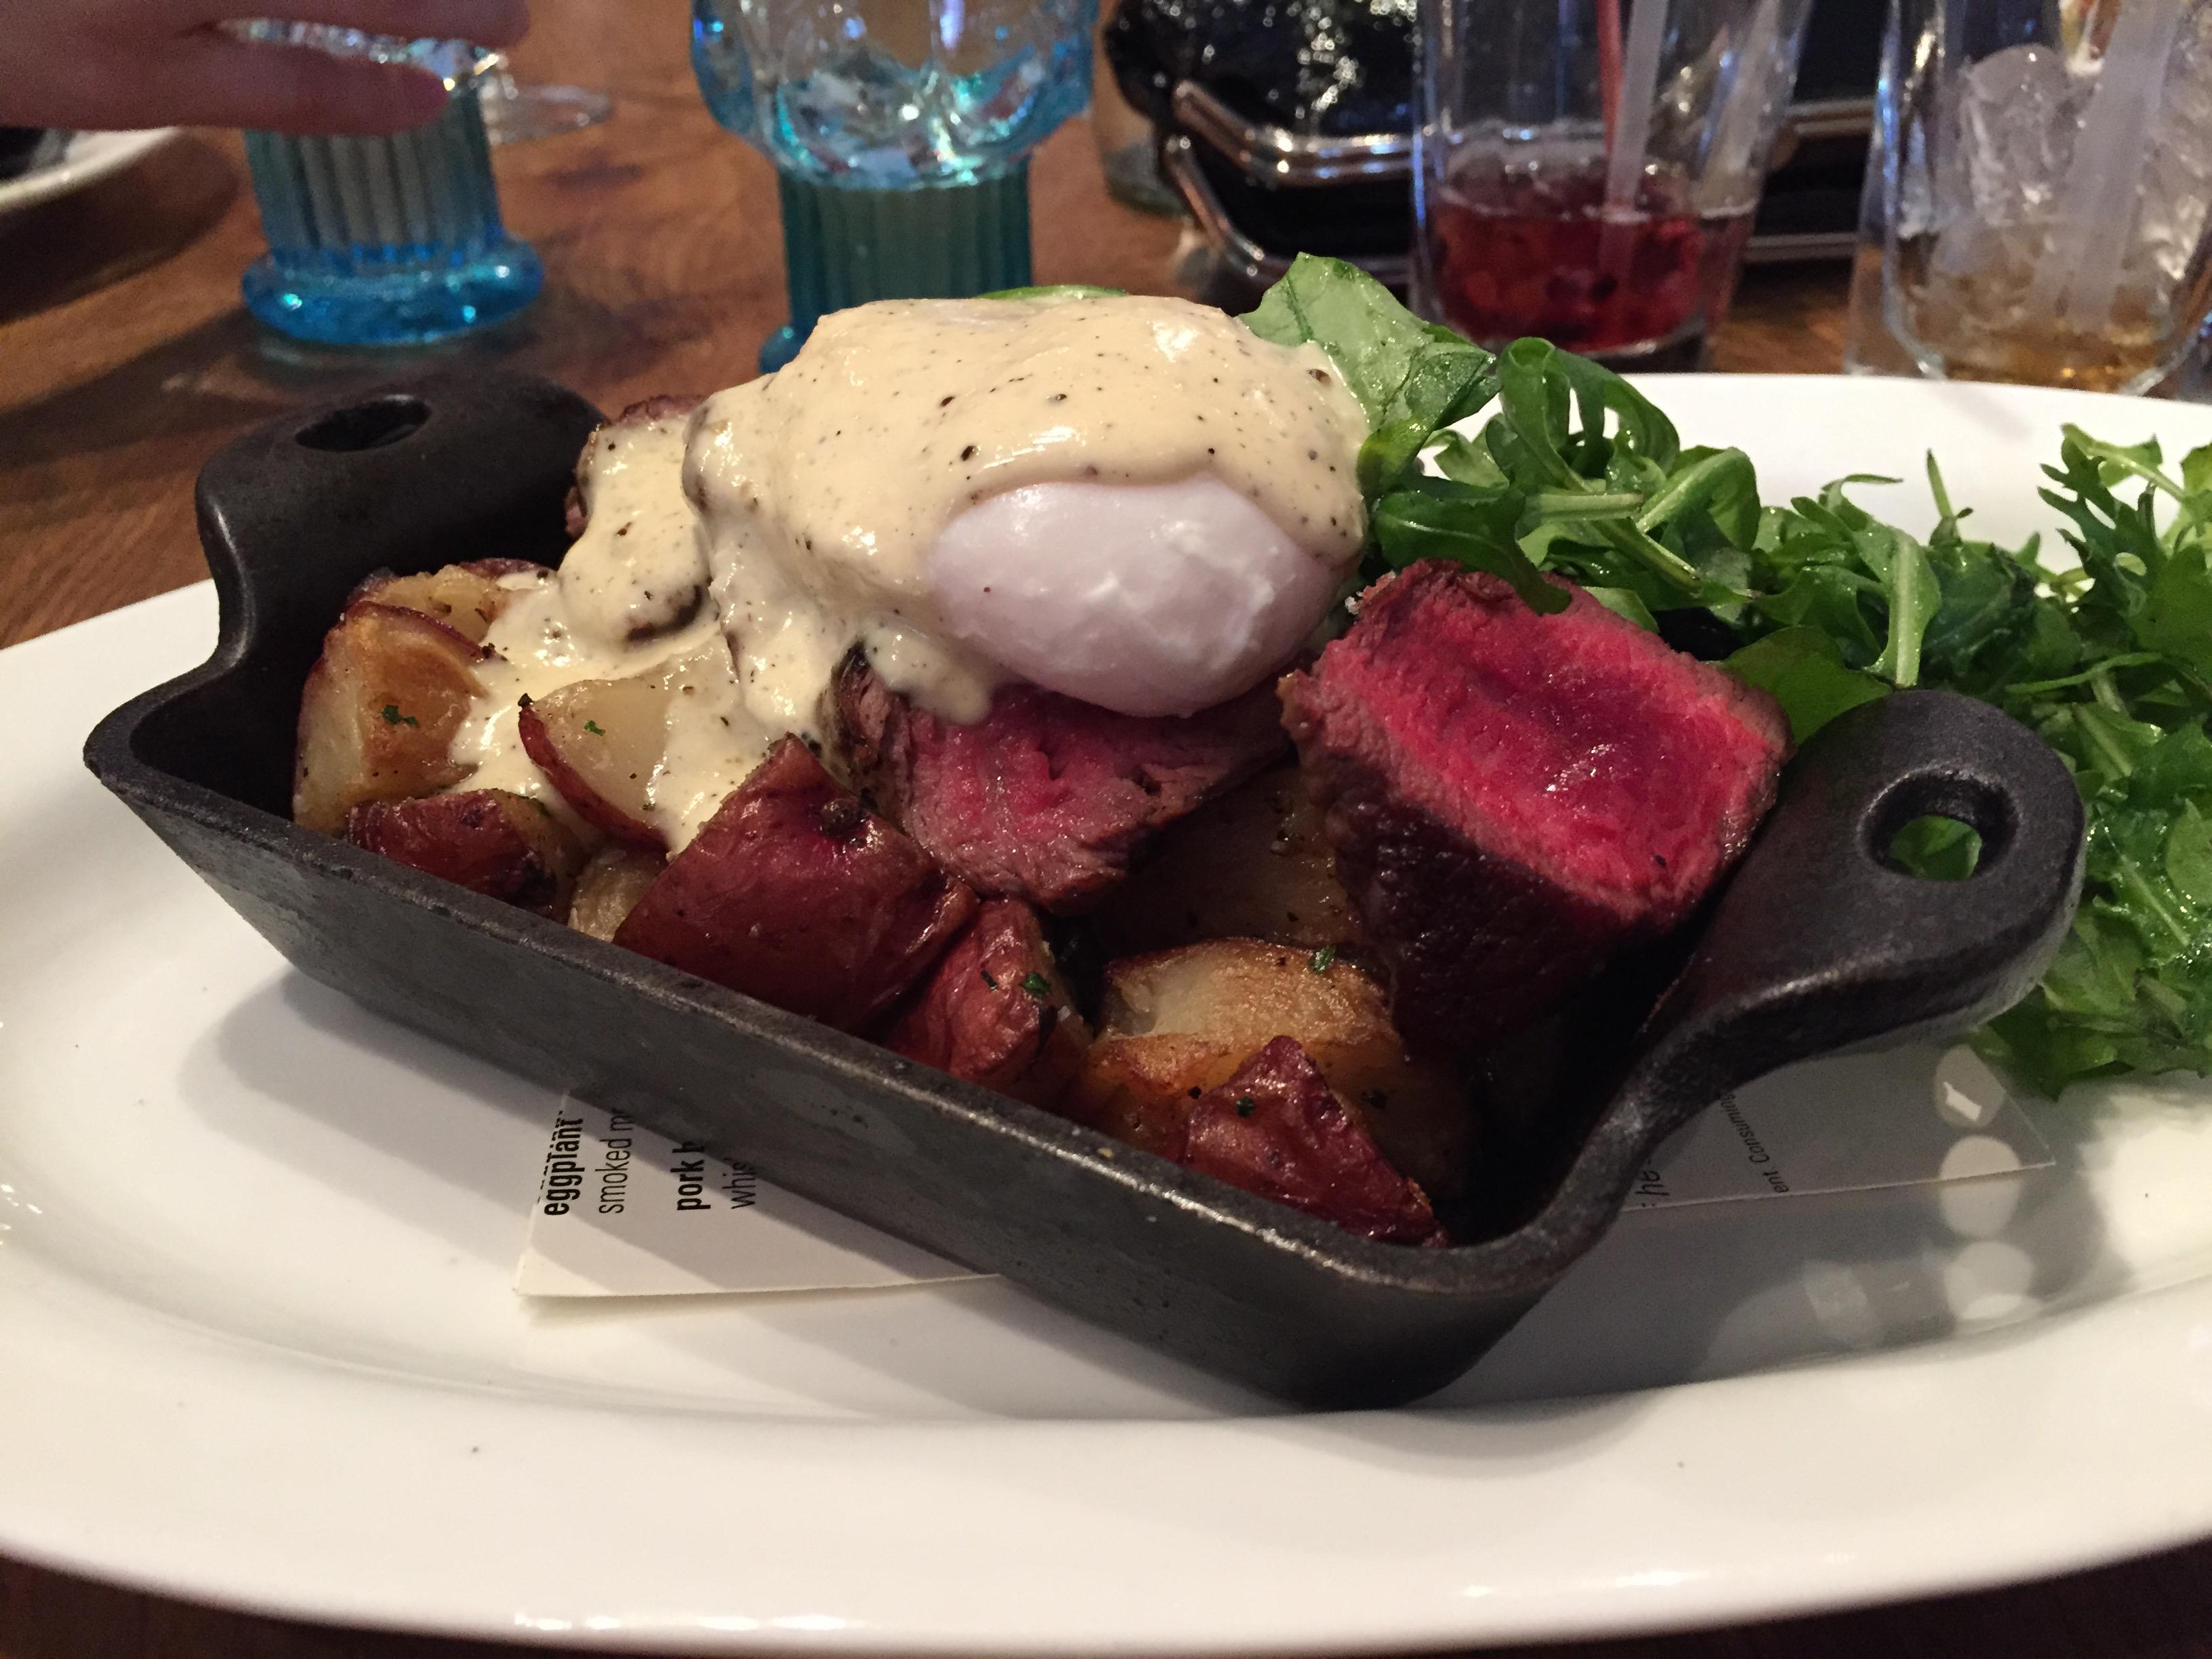 Cowboy Steak with eggs, potatoes, and horseradish-black pepper hollandaise